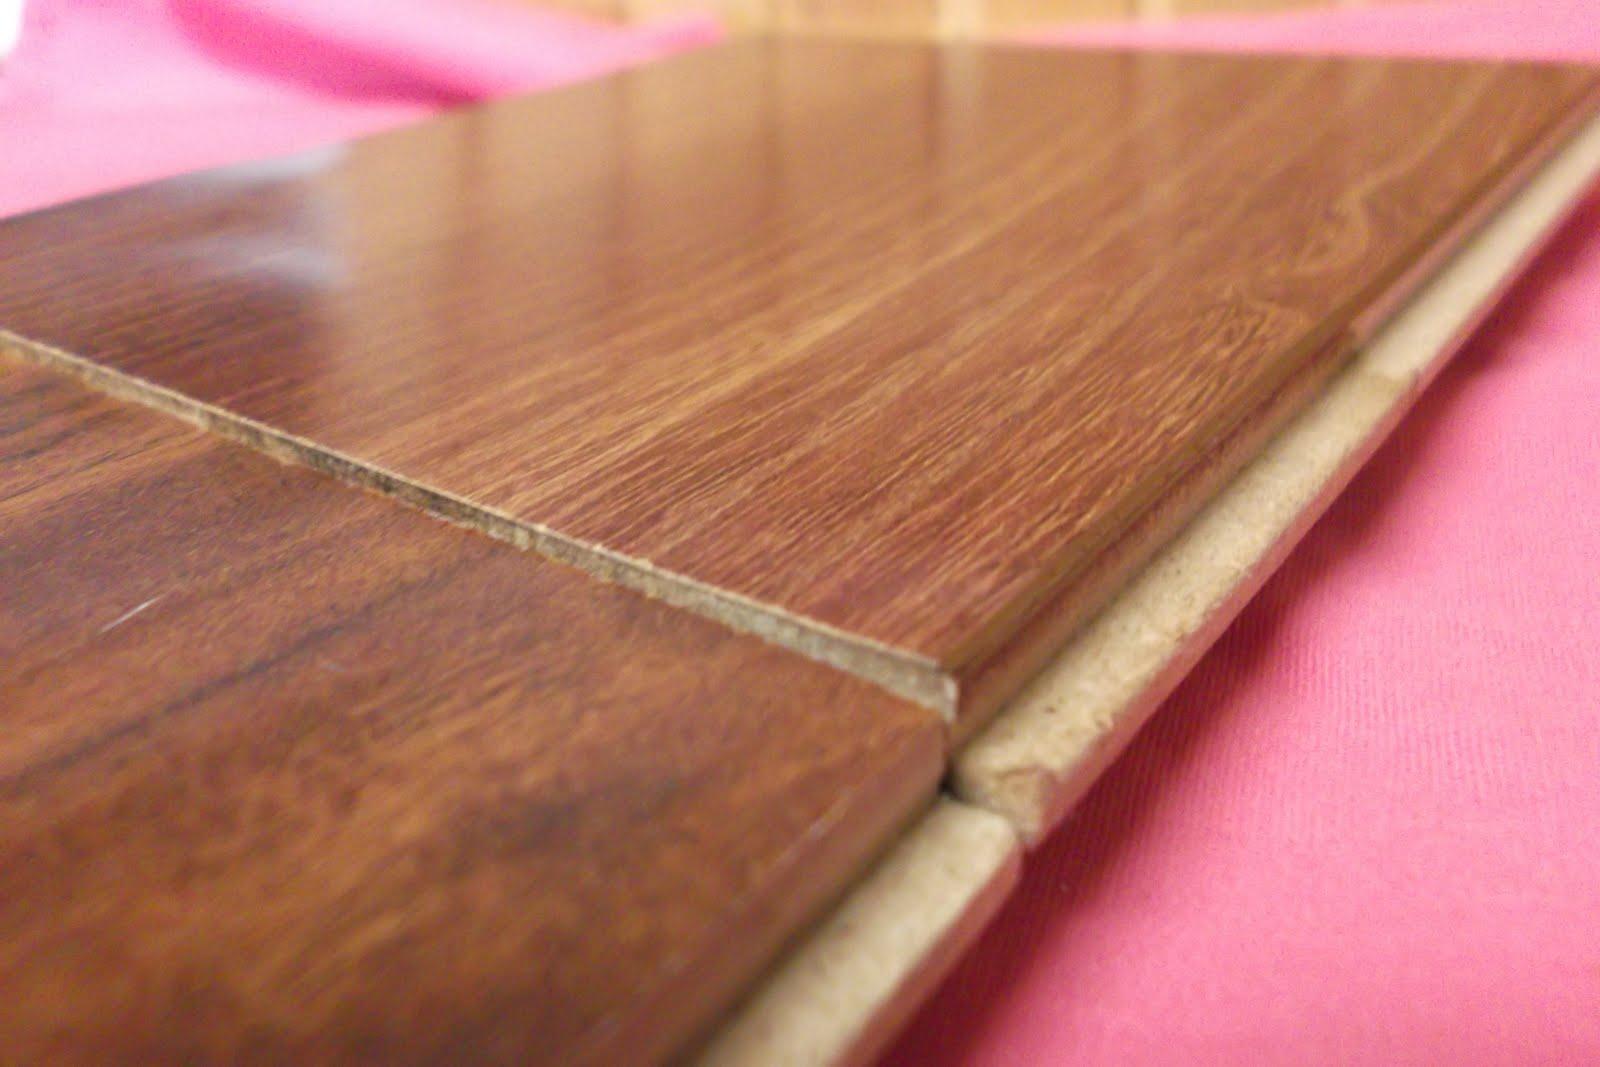 Laminate flooring golden select laminate flooring costco for Golden select laminate flooring